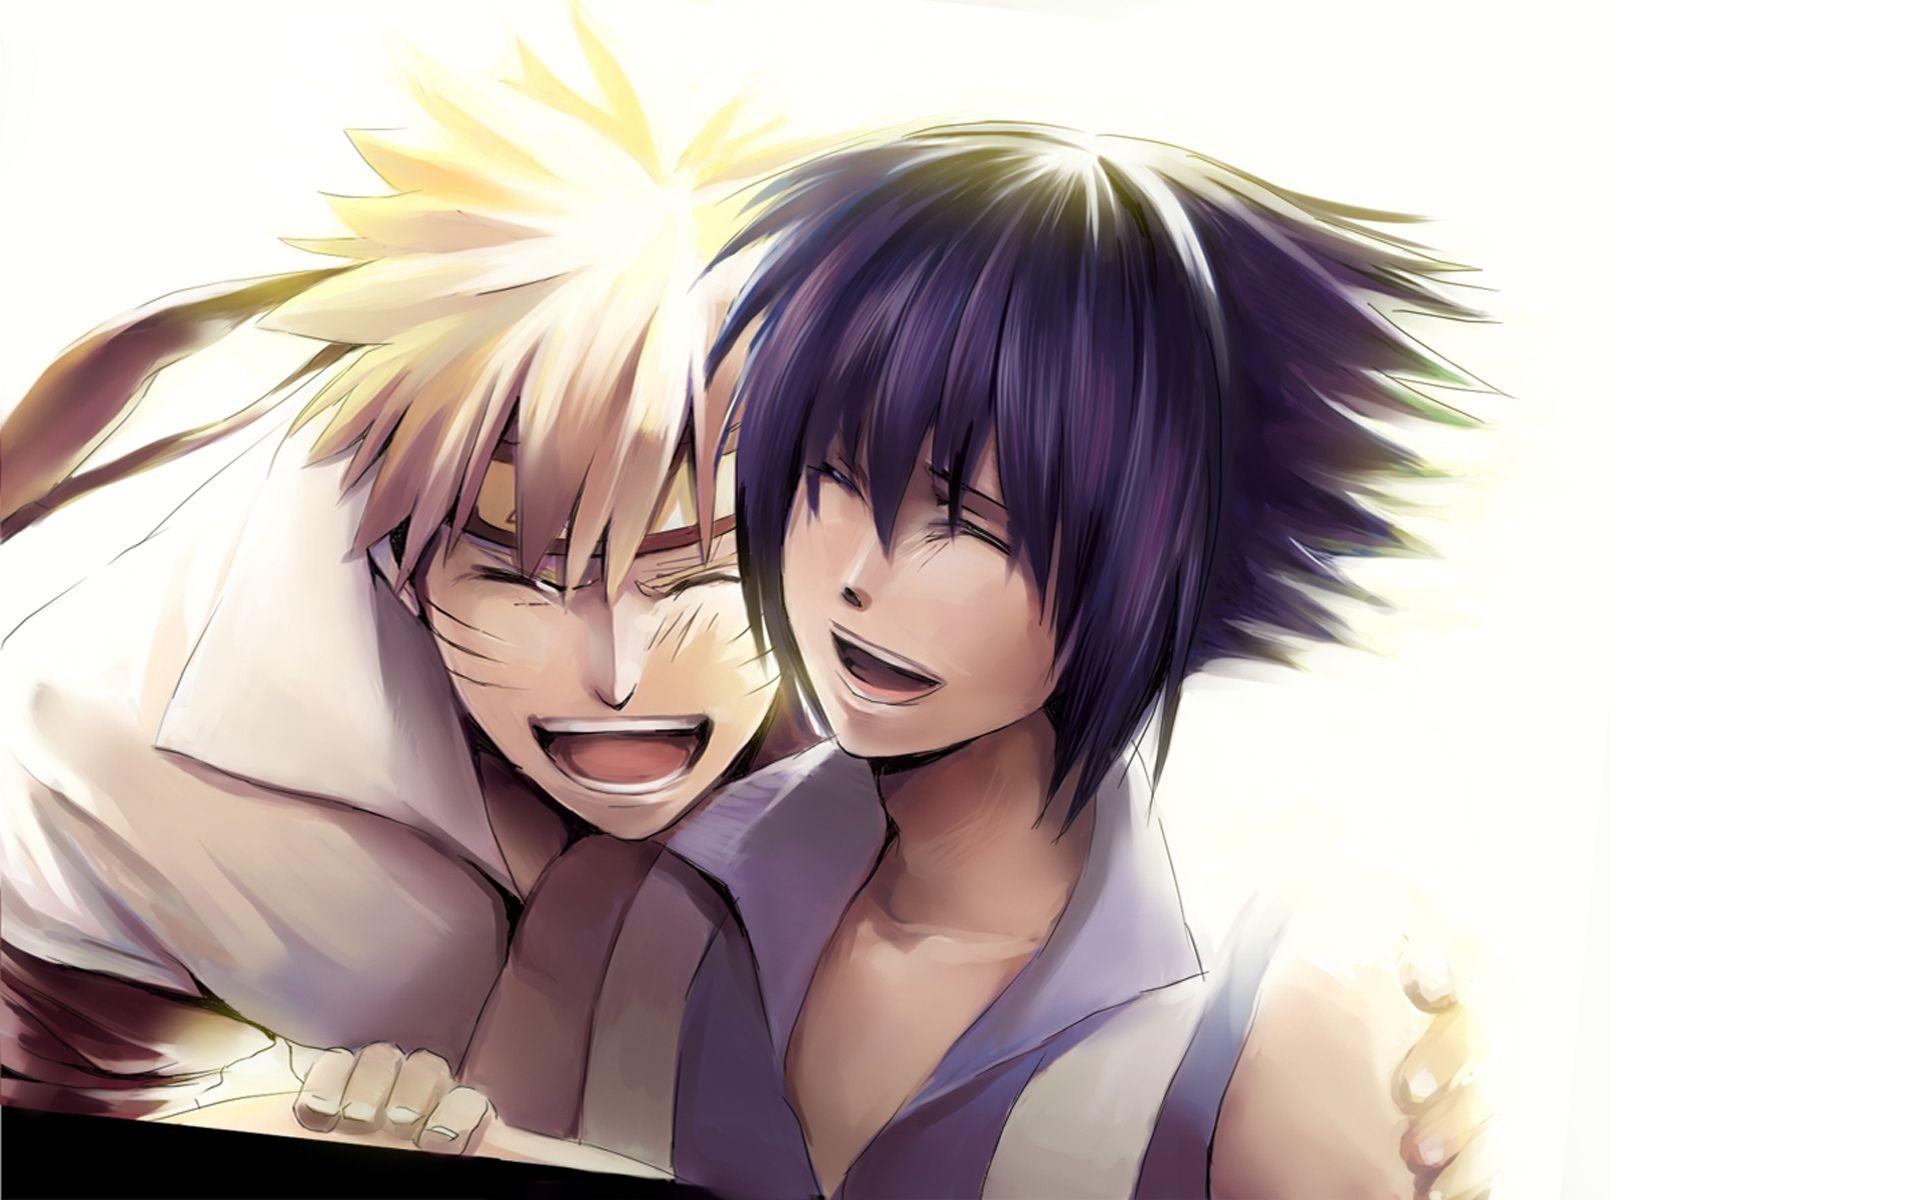 Naruto And Sasuke art, Wallpaper Picture